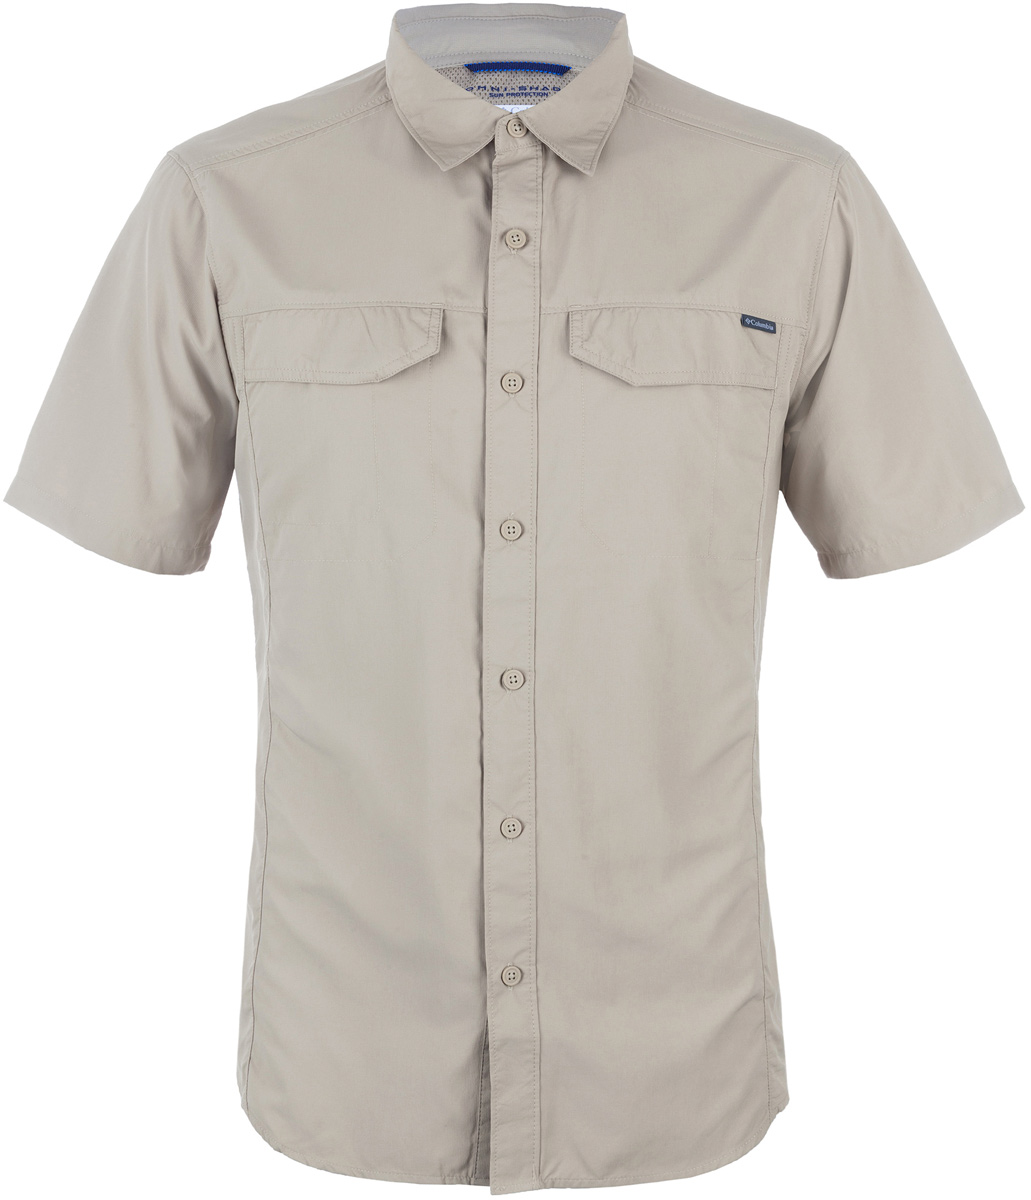 Рубашка мужская Columbia Silver Ridge SS Shirt, цвет: бежевый. 1441661-265. Размер L (48/50) columbia рубашка с длинным рукавом мужская columbia boulder ridge